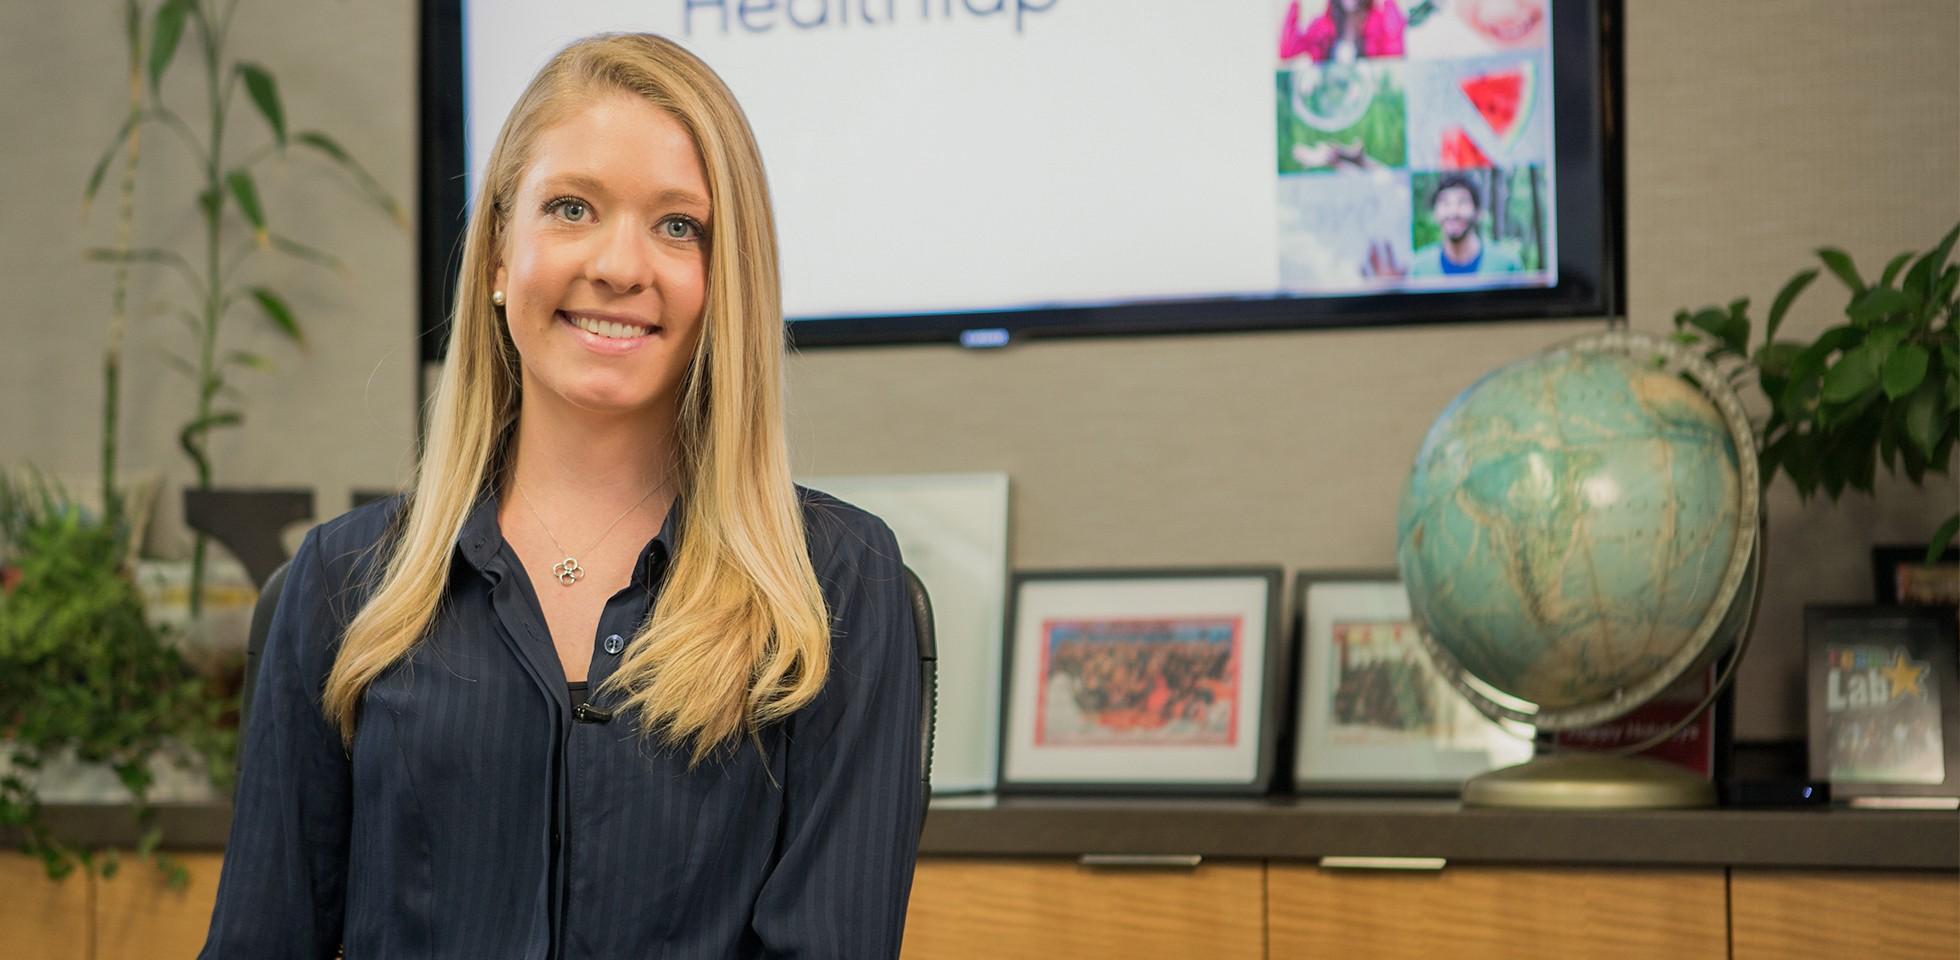 Sofie Rasmussen, Dr., Medical Expert Network Lead - HealthTap Careers